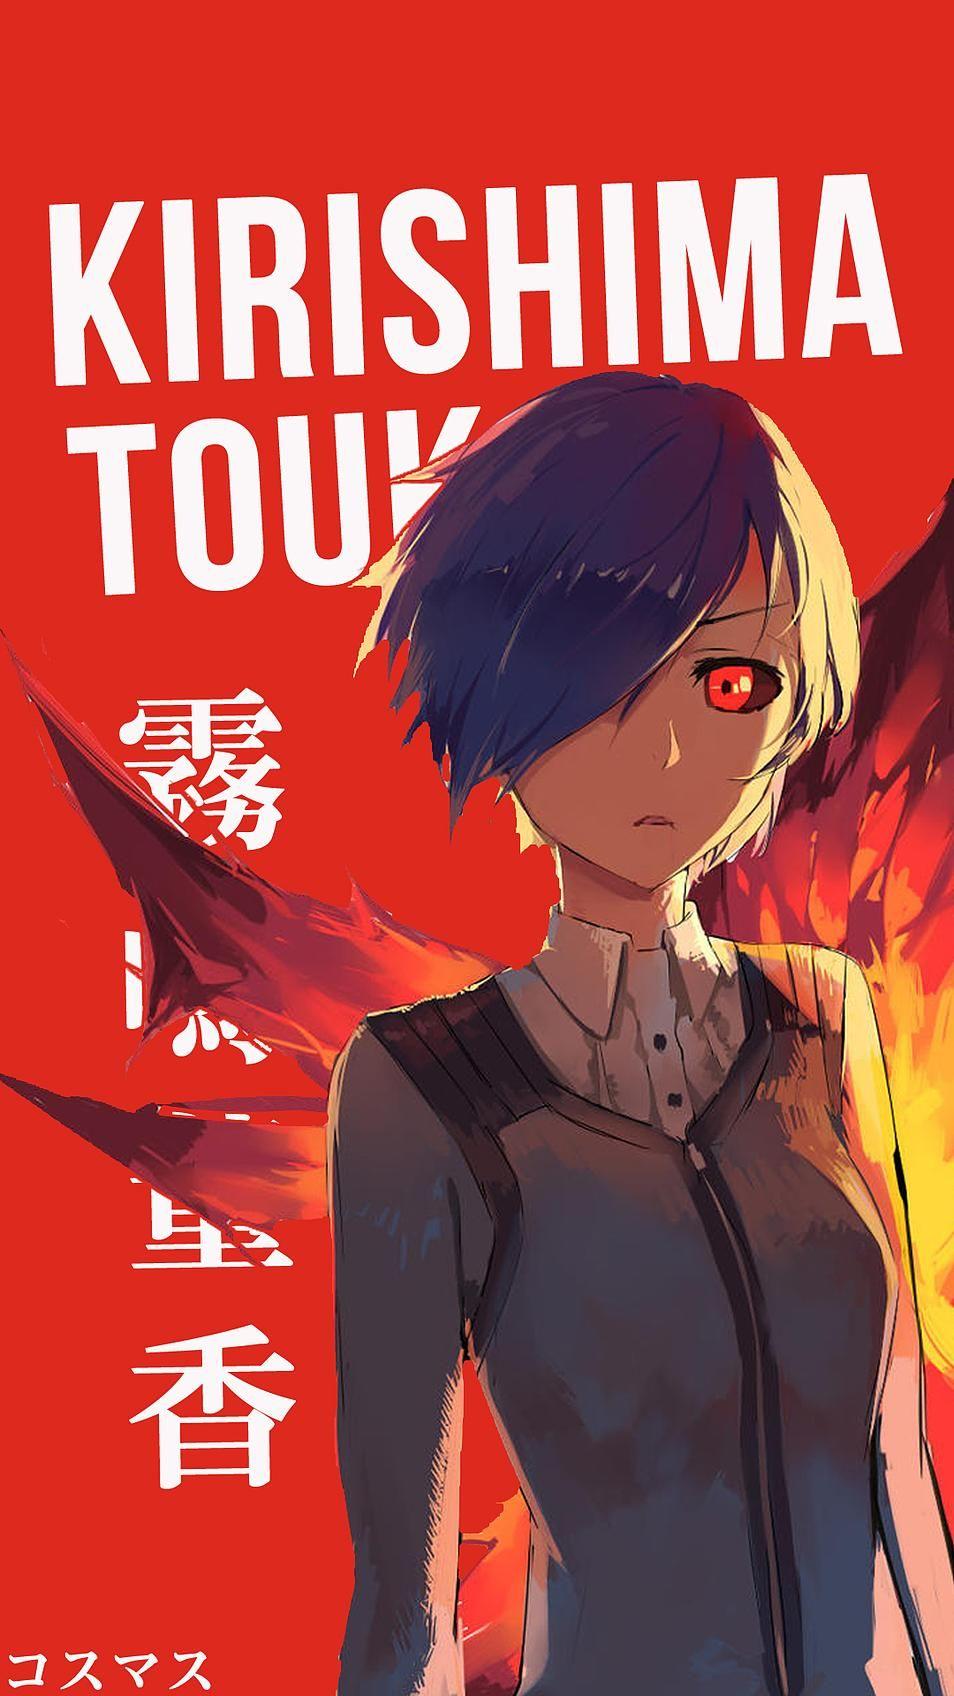 Kirishima Touka Korigengi Wallpaper Anime Anime Wallpaper Phone Touka Kirishima Anime Wallpaper